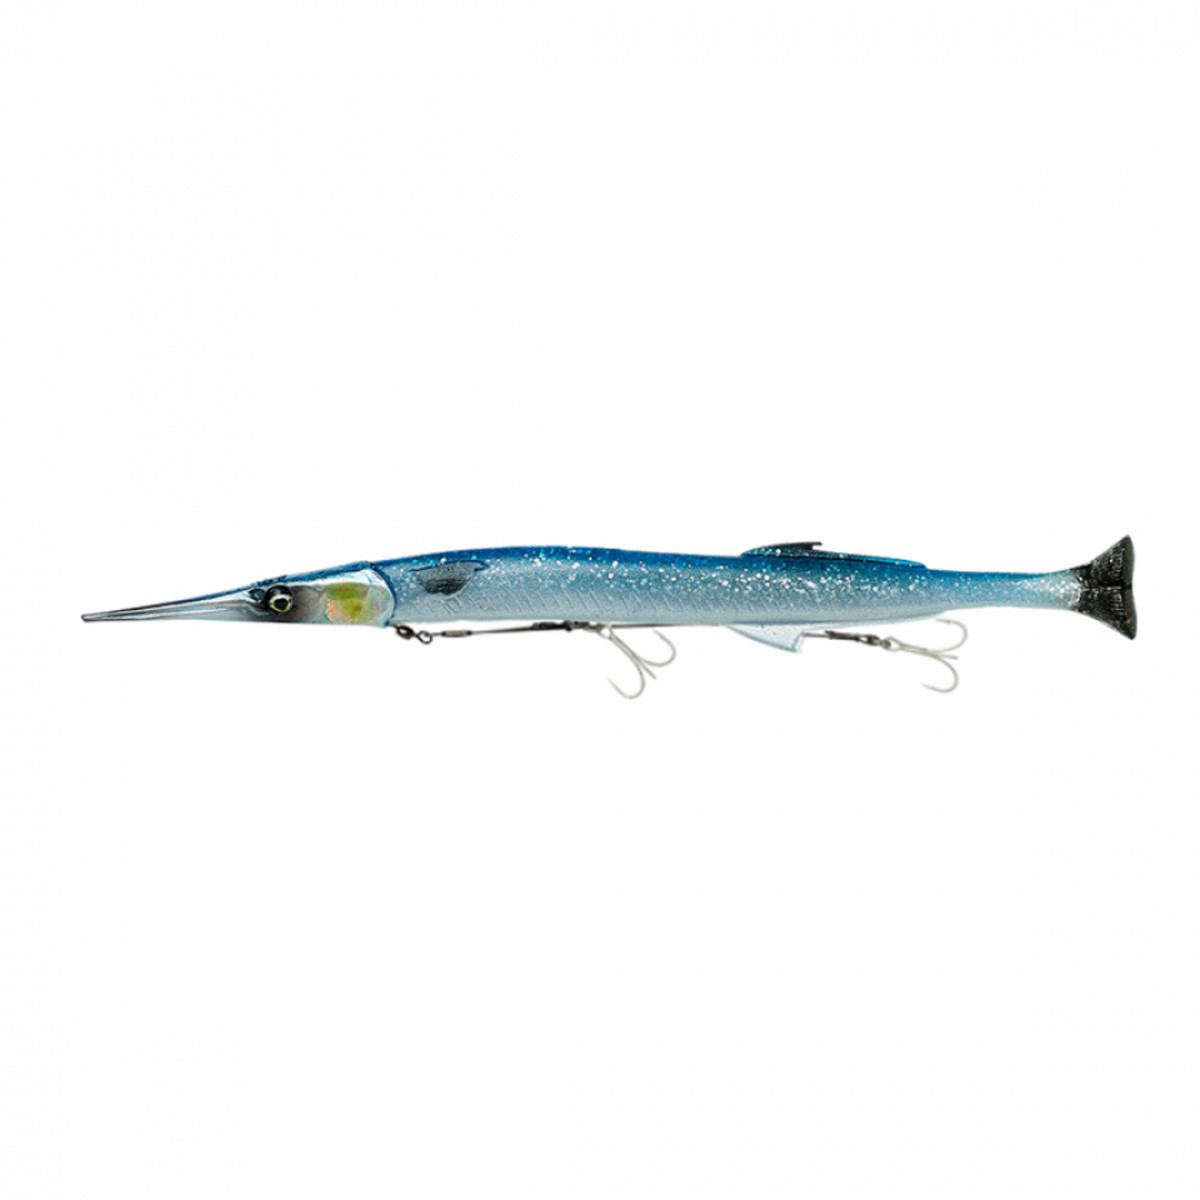 3D Line Thru Needlefish Pulse Tail